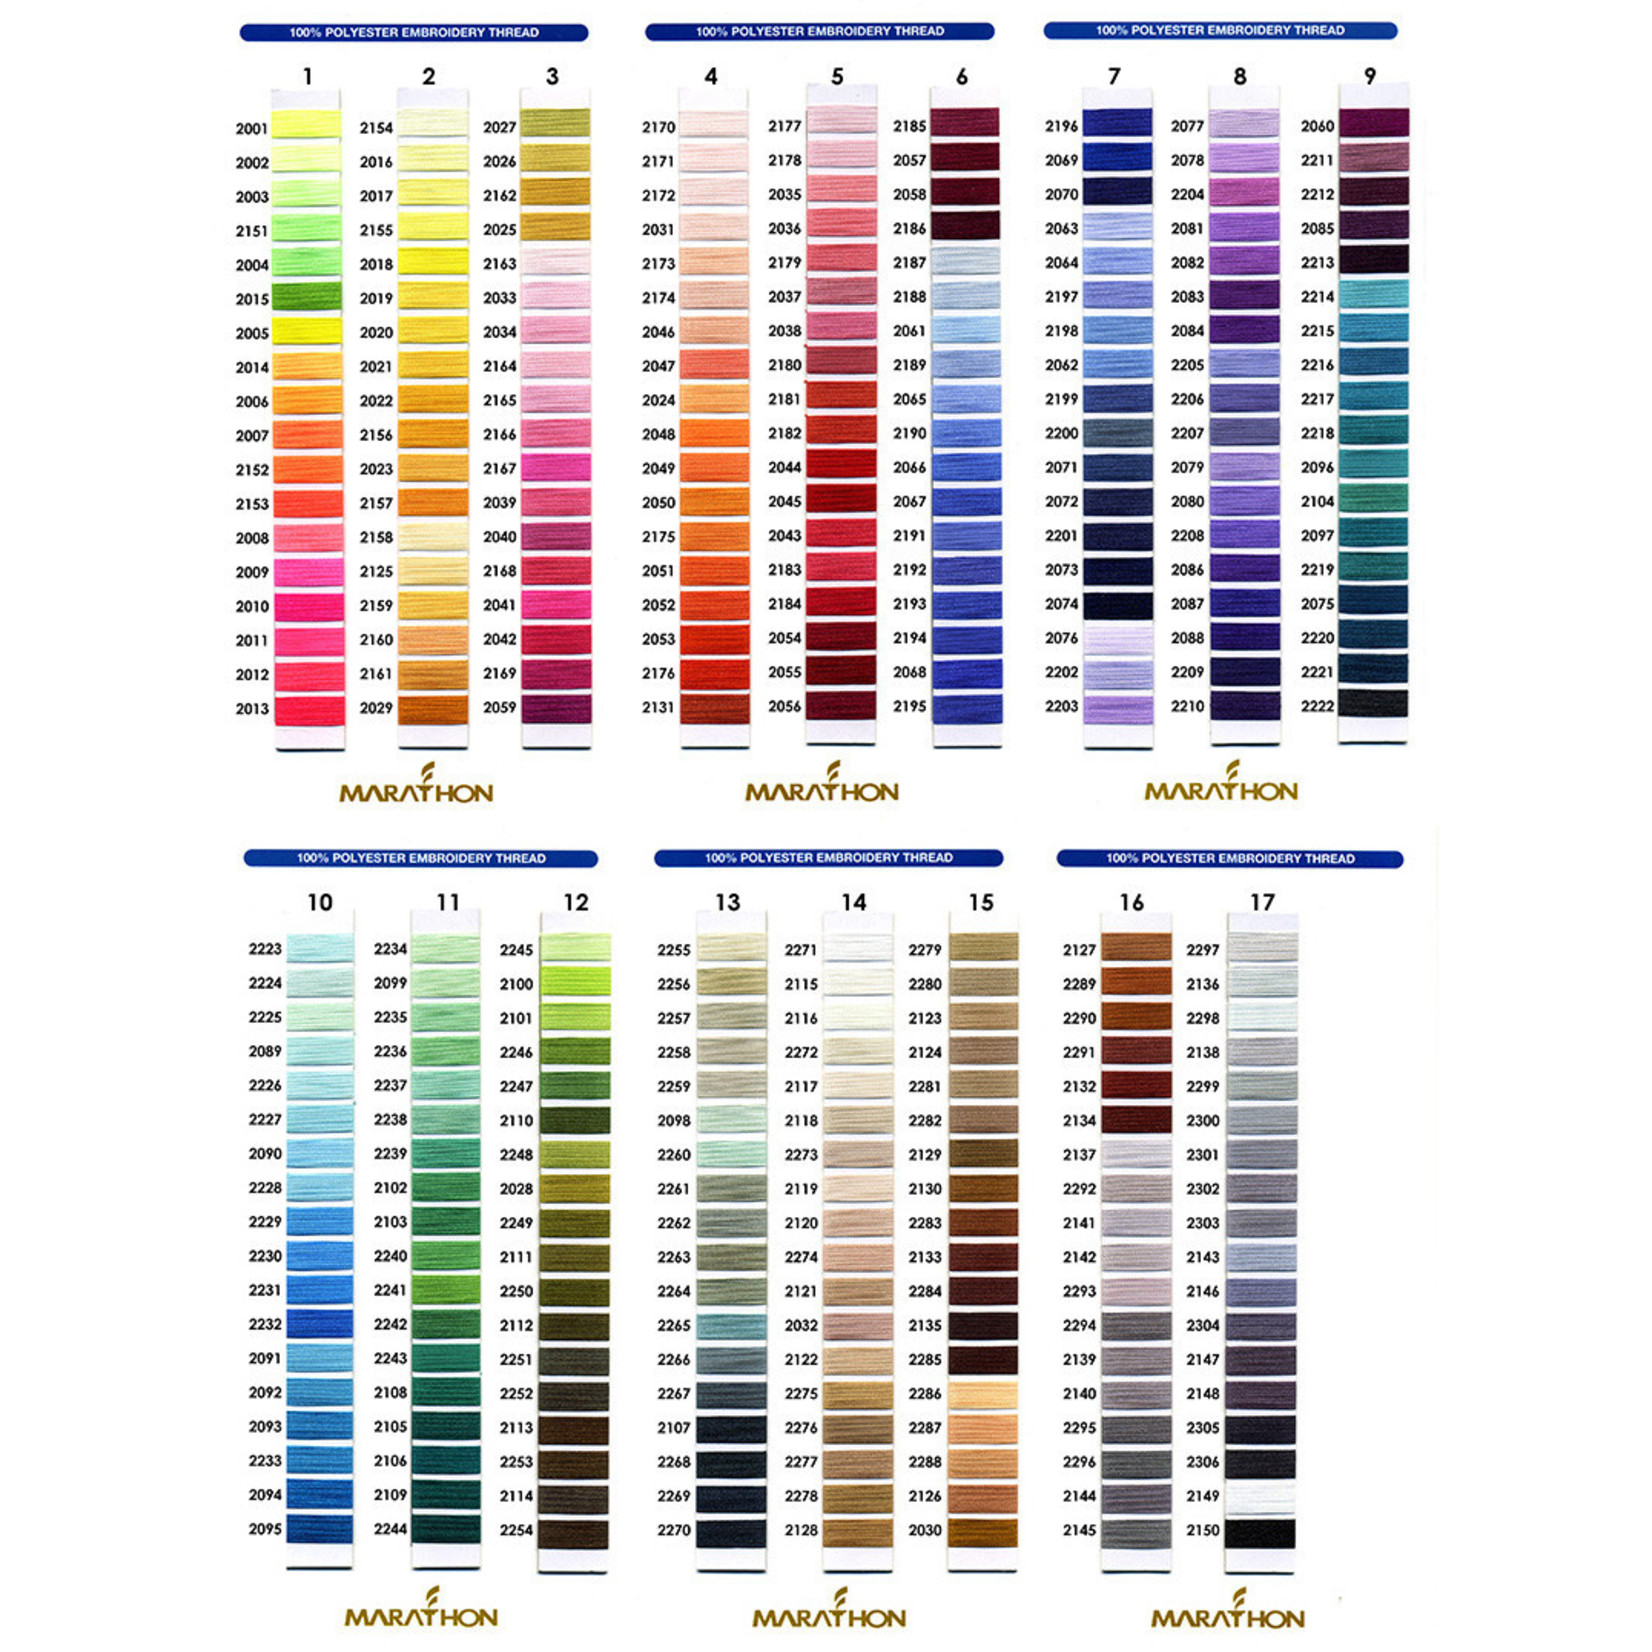 MARATHON Colour 2301 - 5000mtr POLY EMBROIDERY THREAD